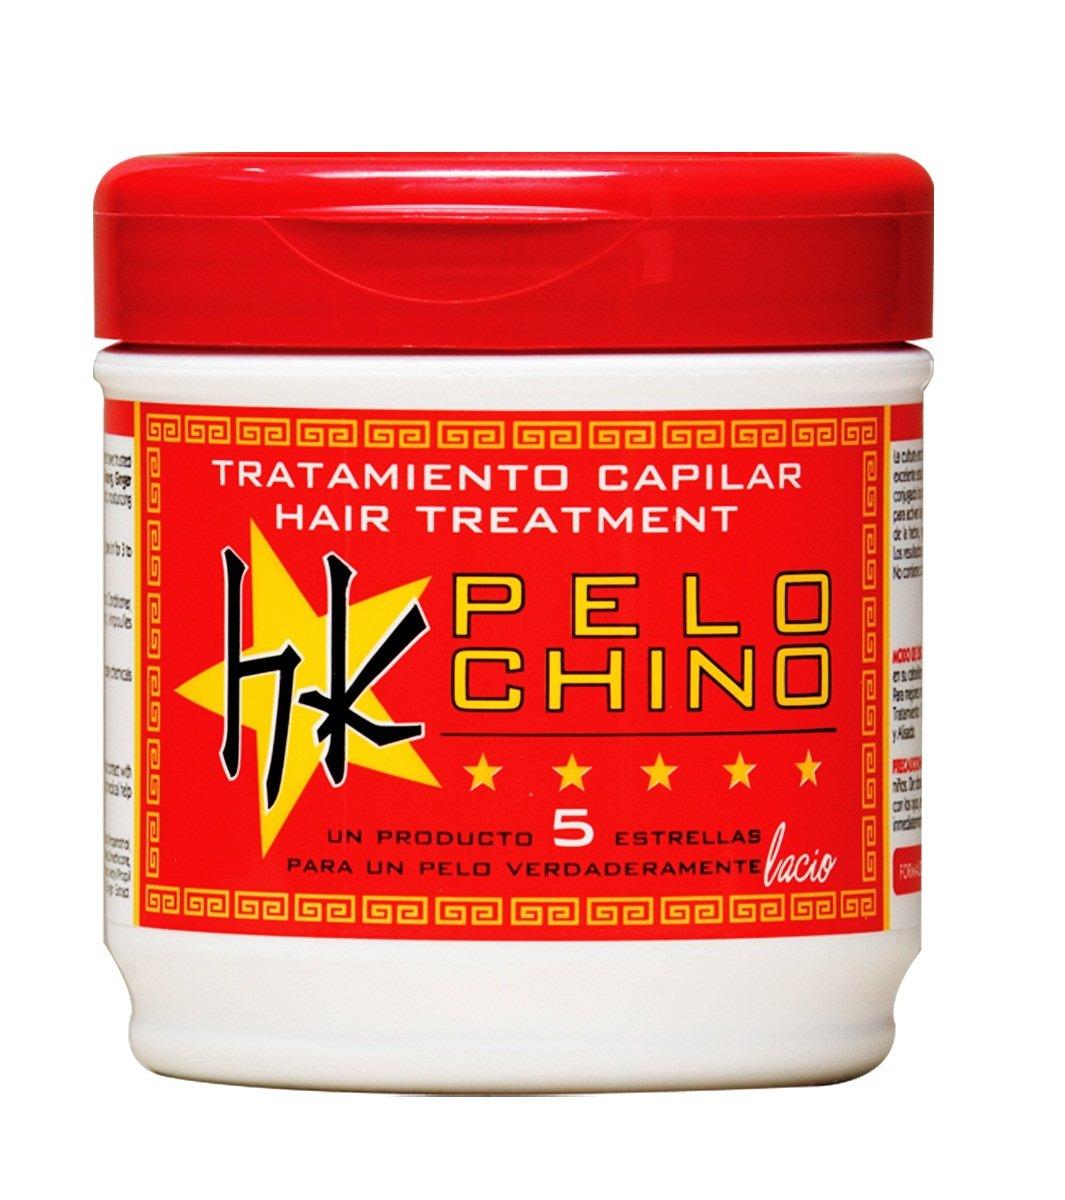 Pelo Chino Botanical Hair Treatment